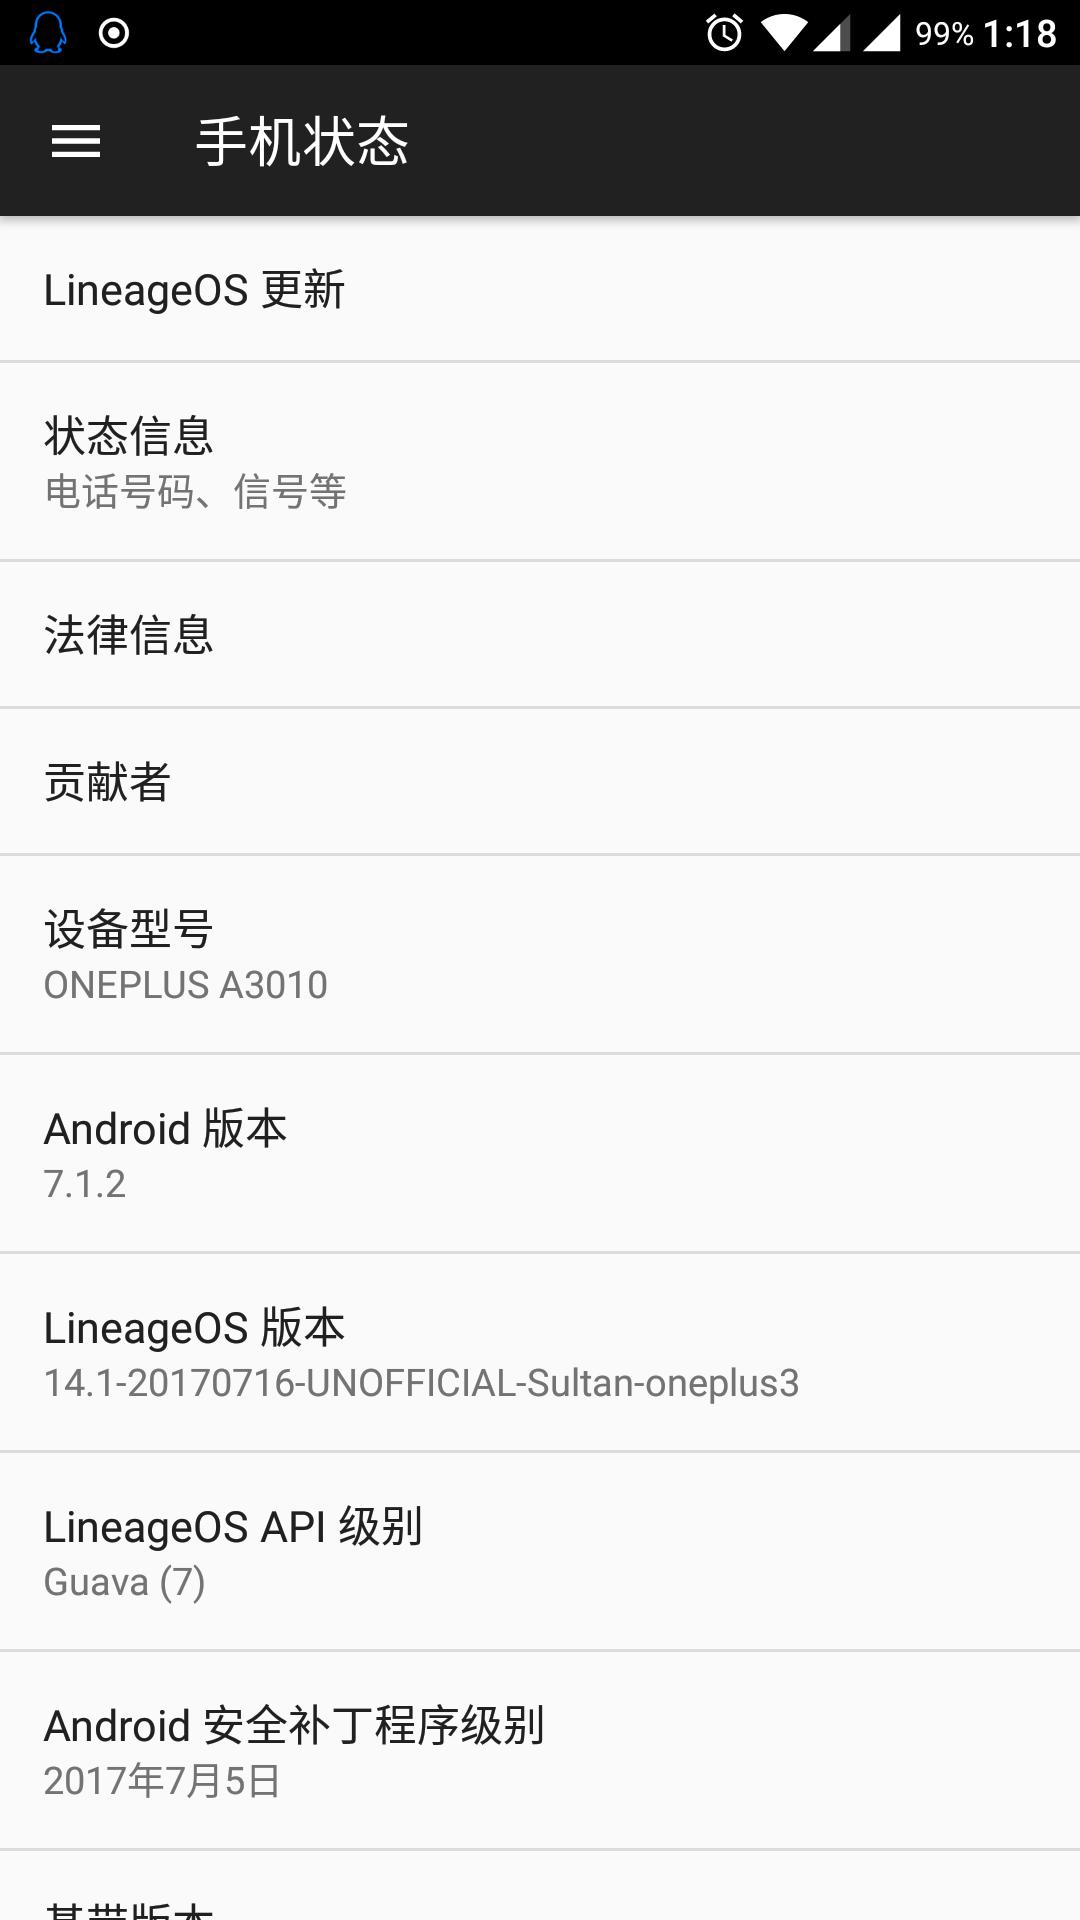 Screenshot_20170718-011848[1].png